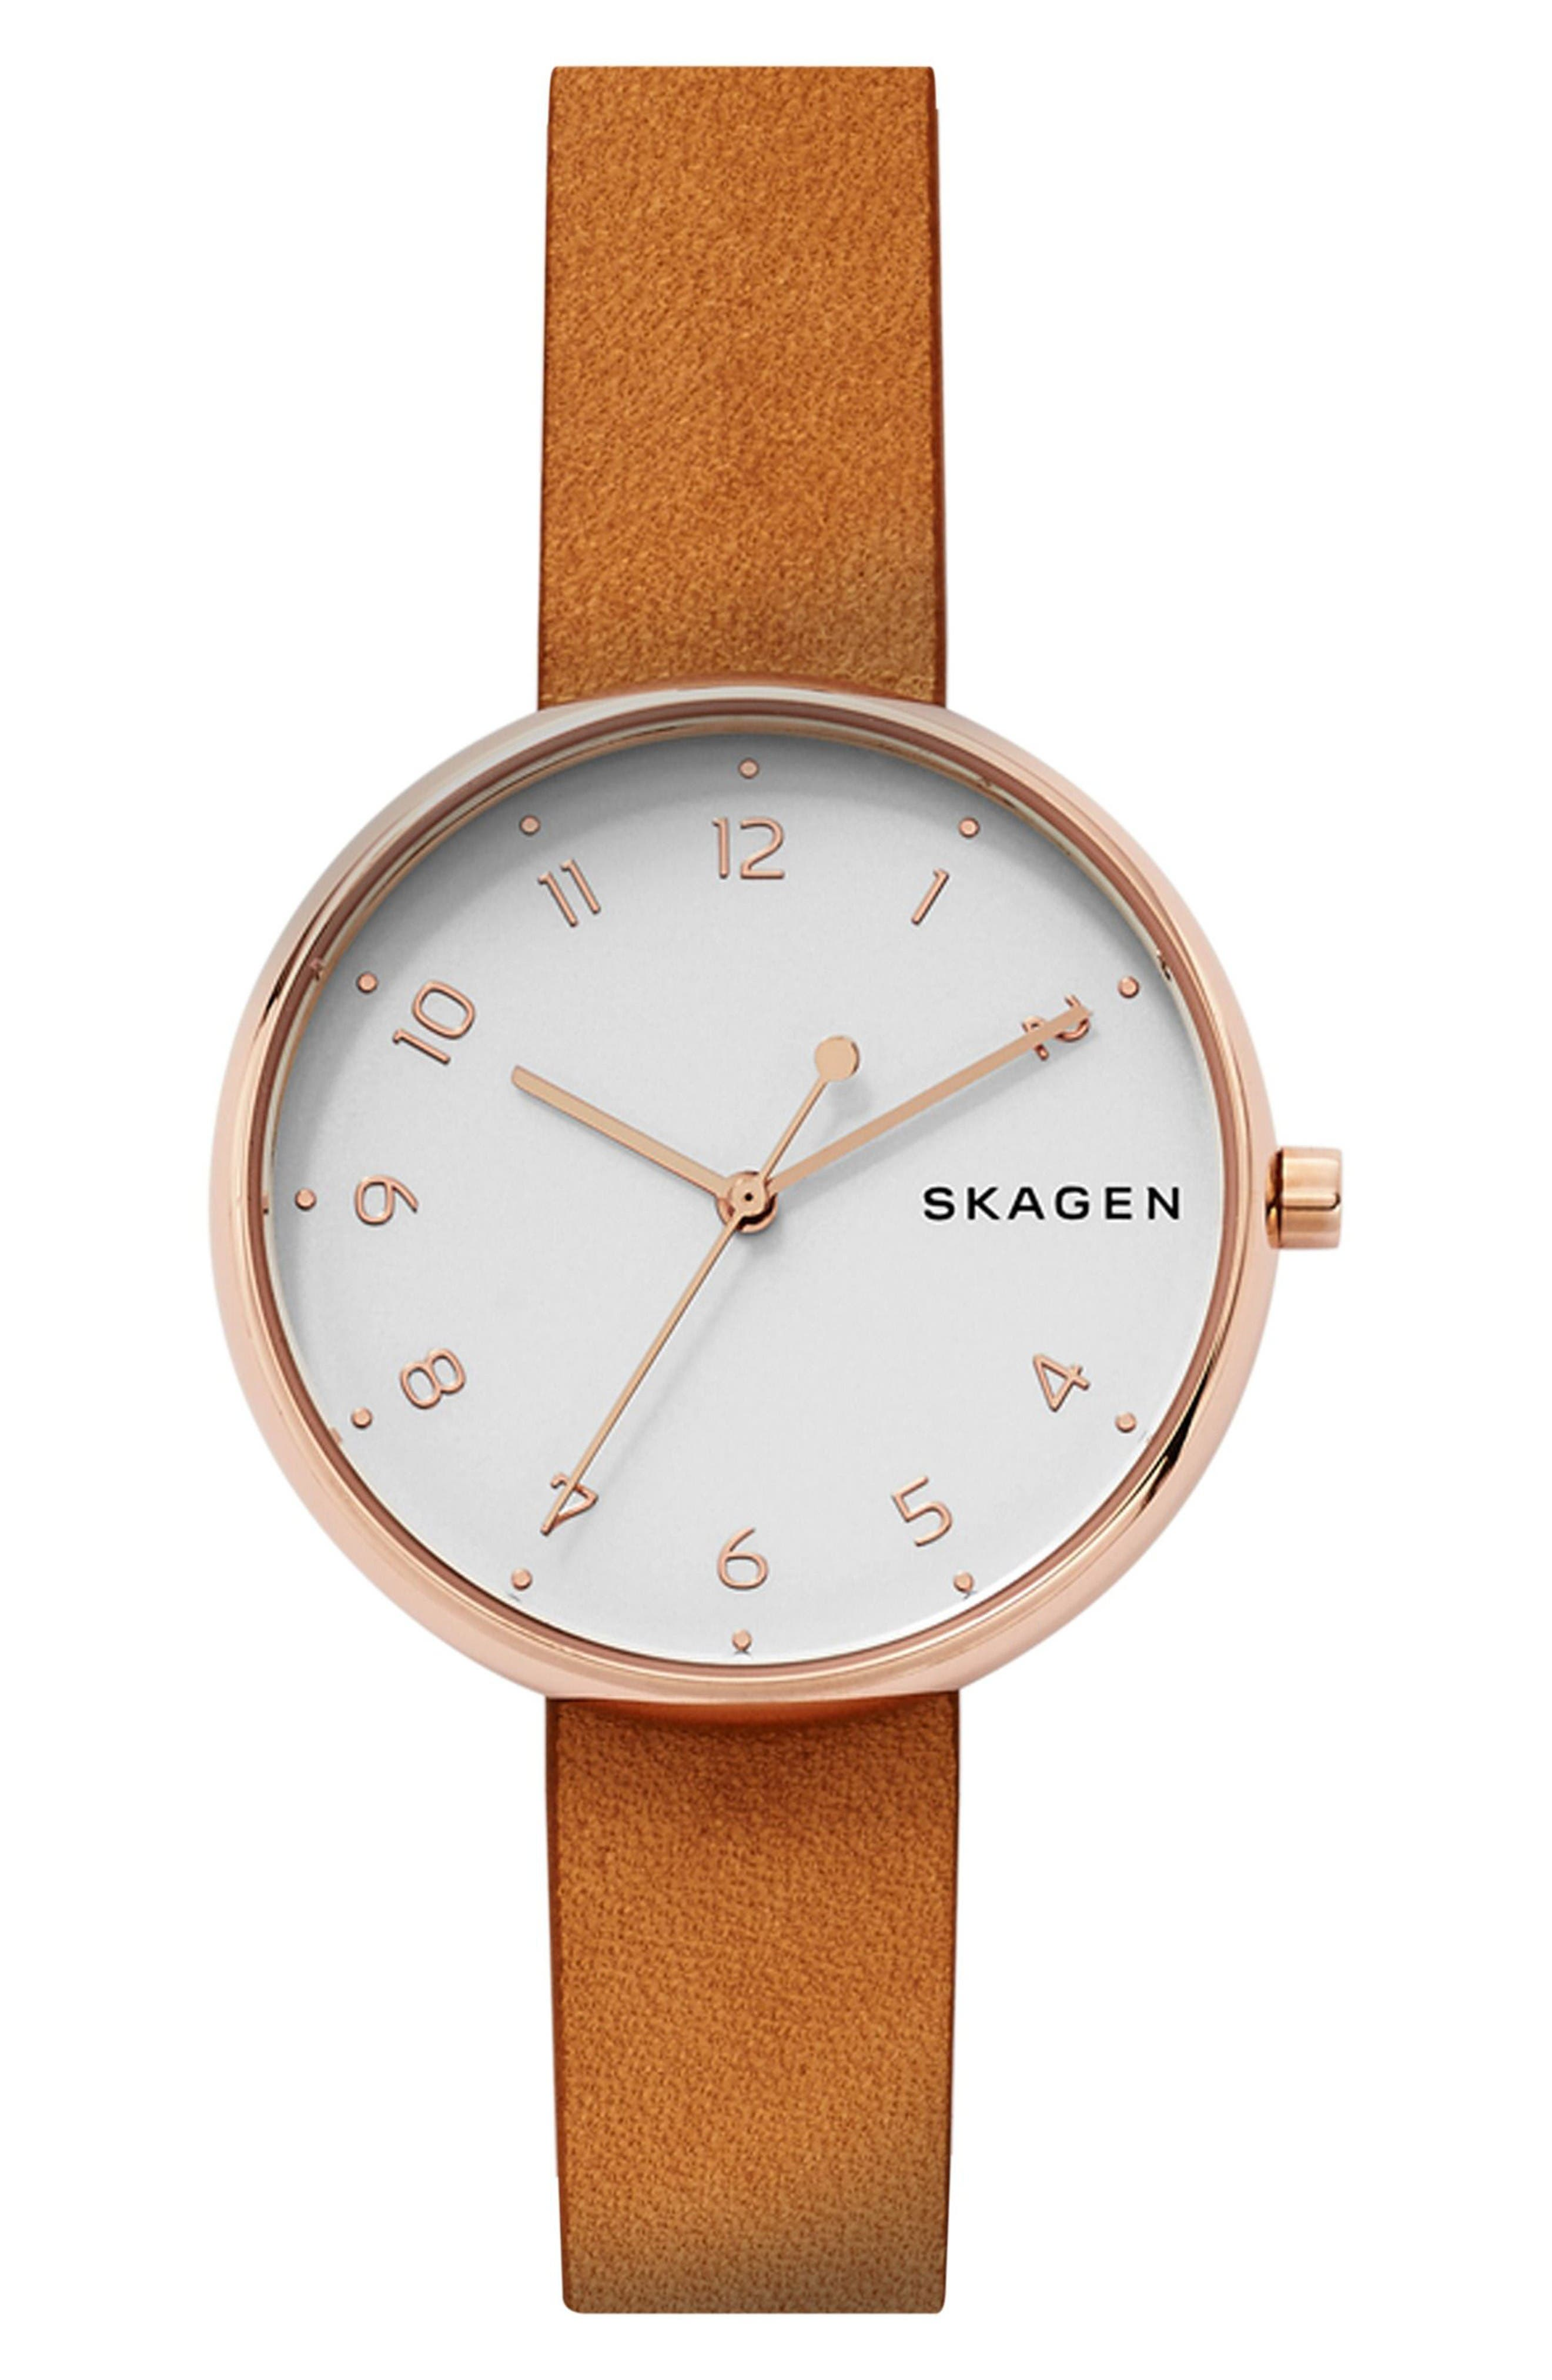 Main Image - Skagen Signatur Leather Strap Watch, 36mm